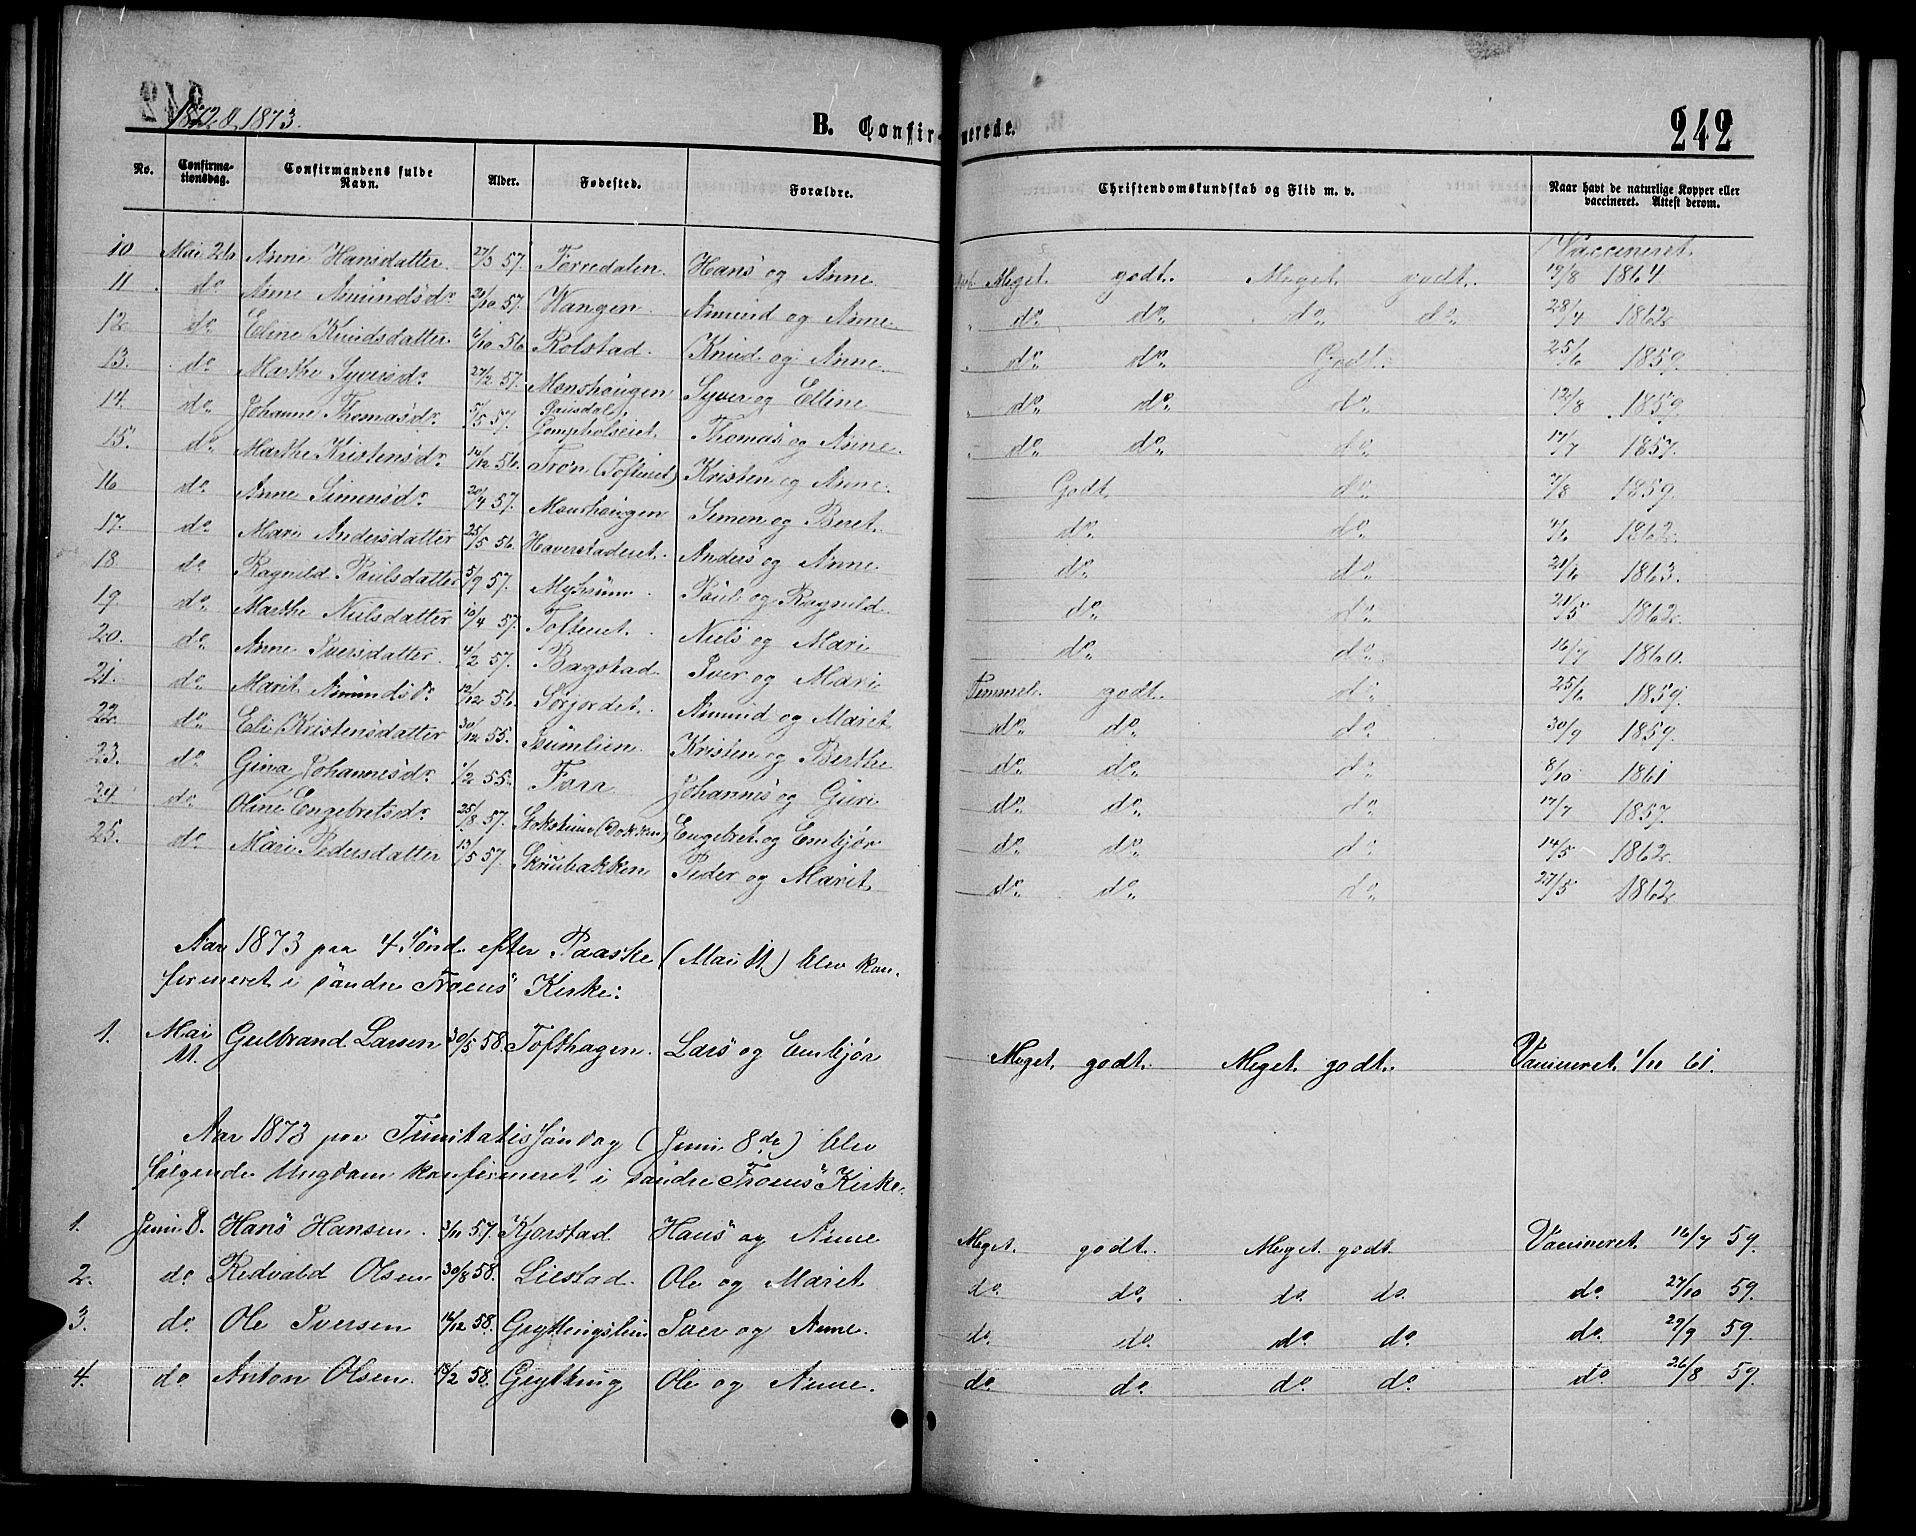 SAH, Sør-Fron prestekontor, H/Ha/Hab/L0002: Klokkerbok nr. 2, 1864-1883, s. 242